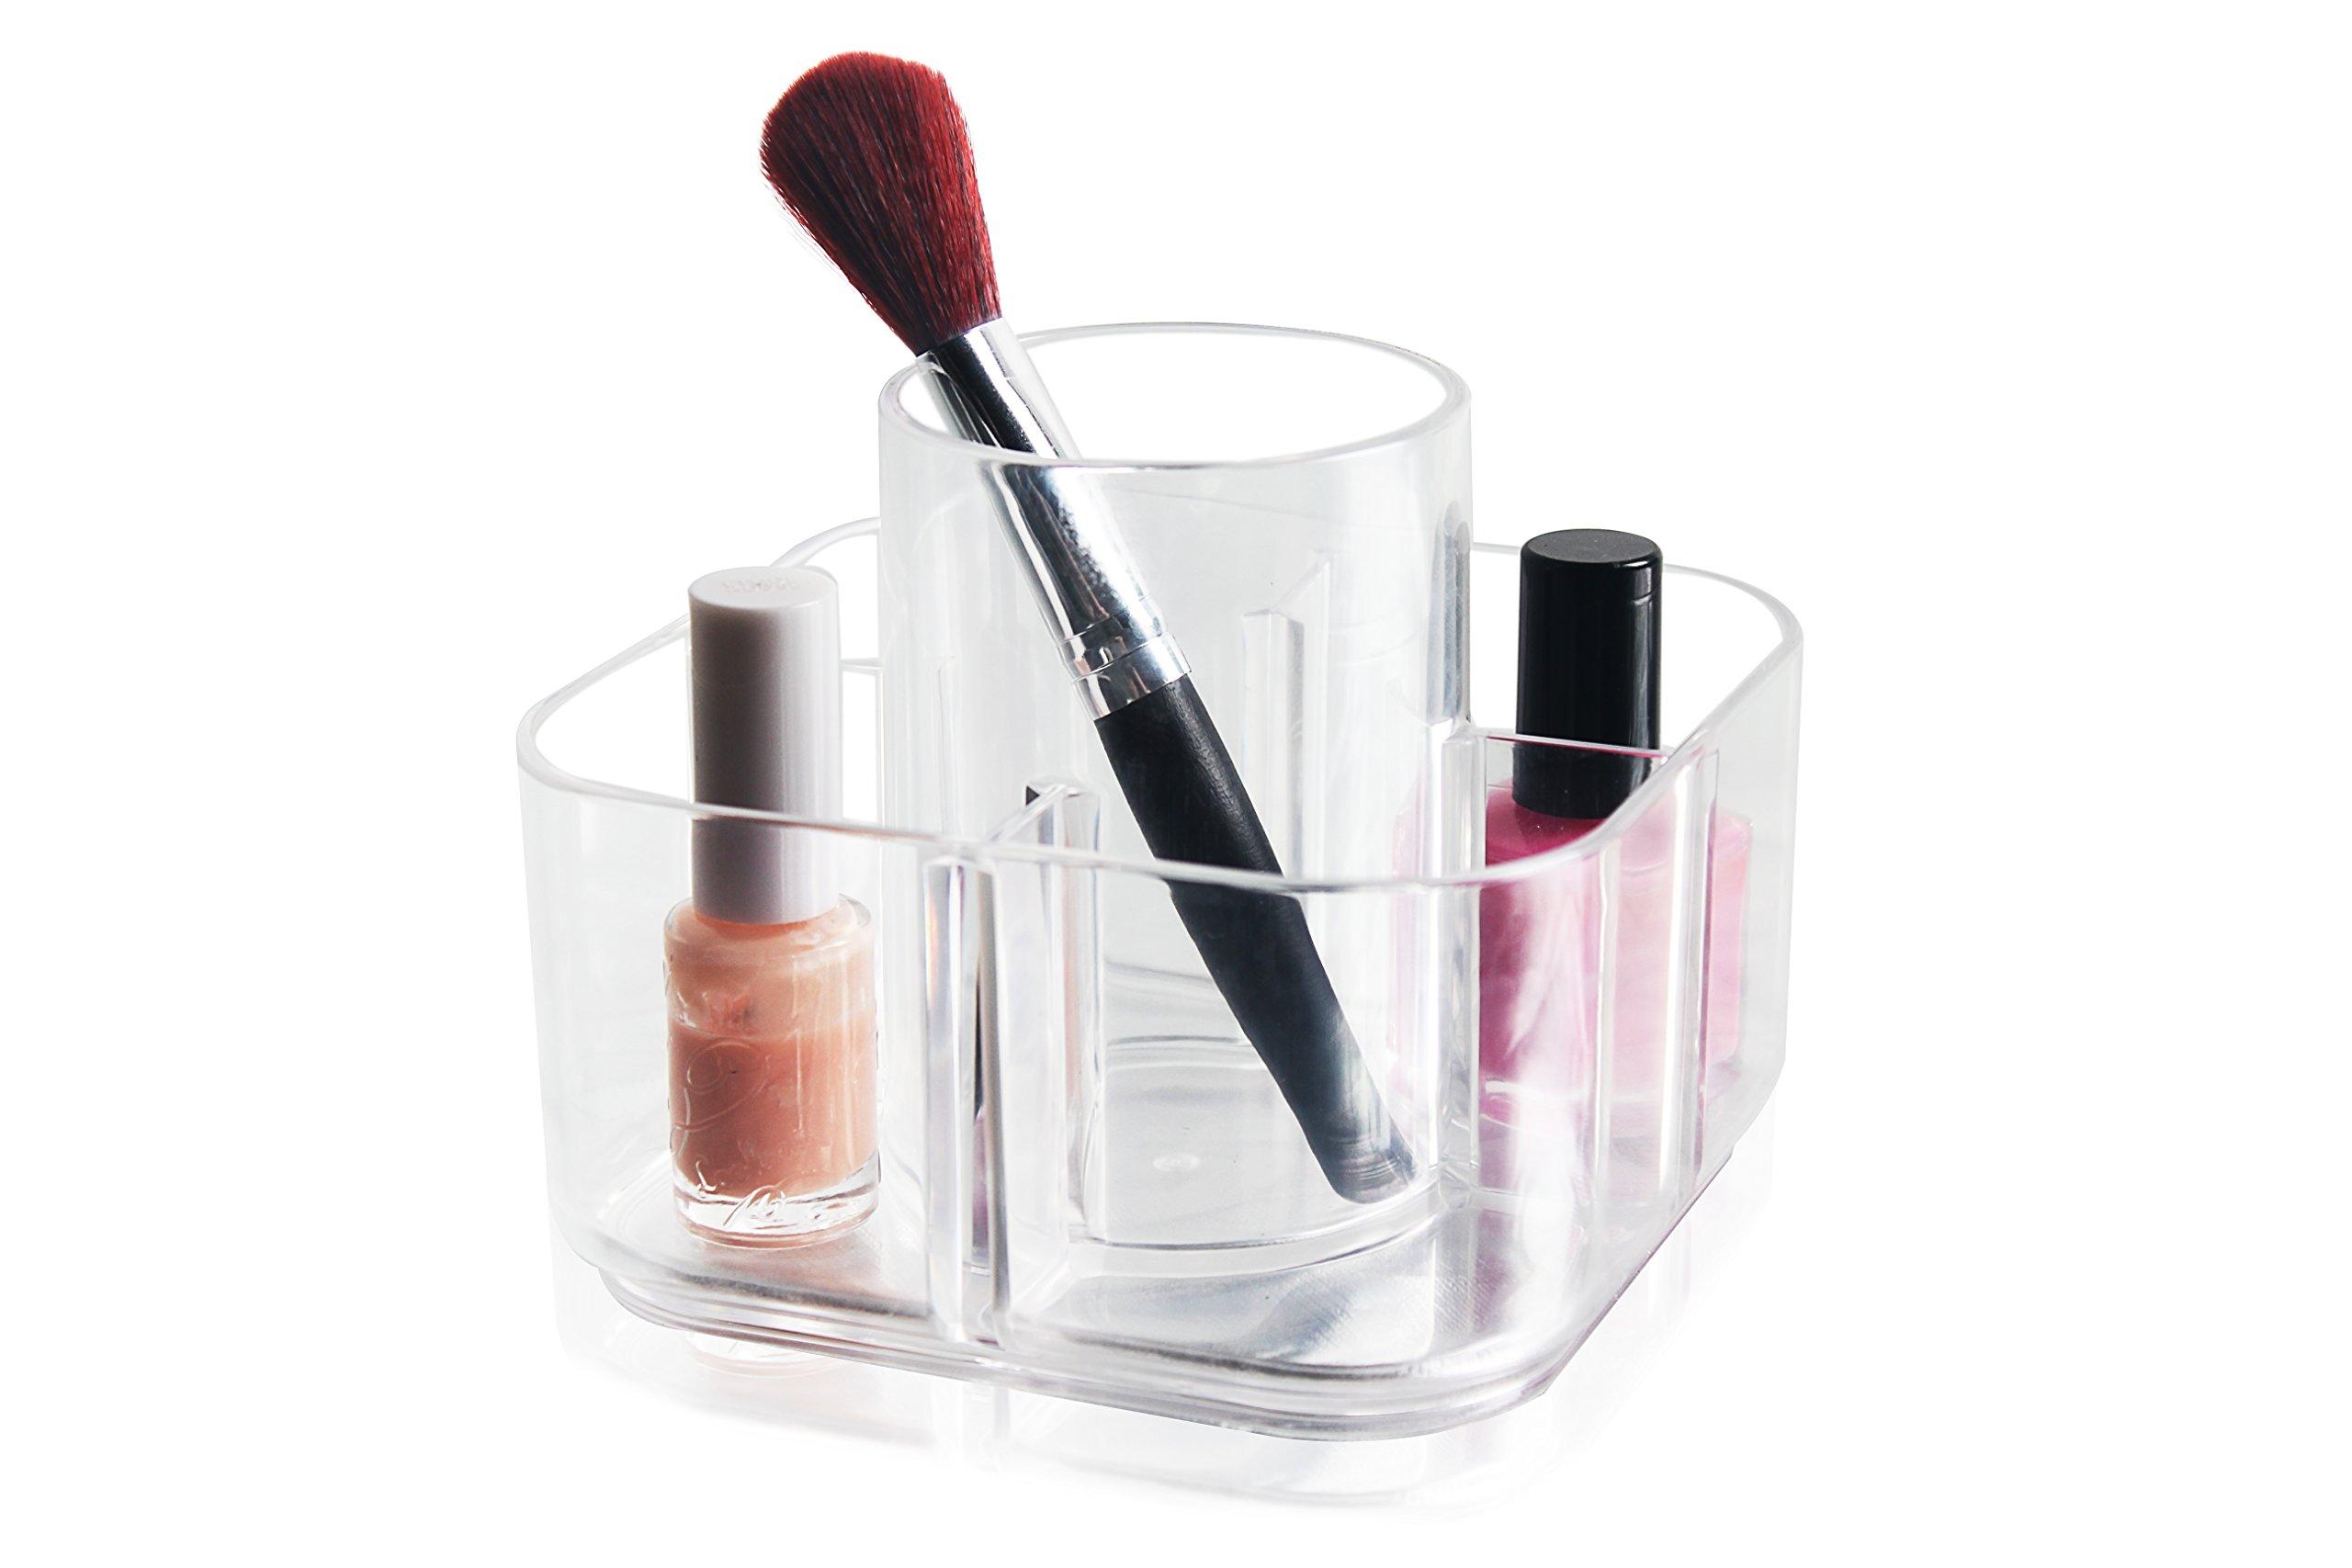 Premium Clear Acrylic Makeup Brush Desktop Storage Organizer, 5 Compartments Acrylic Cosmetic Organizer,1pc/Pack